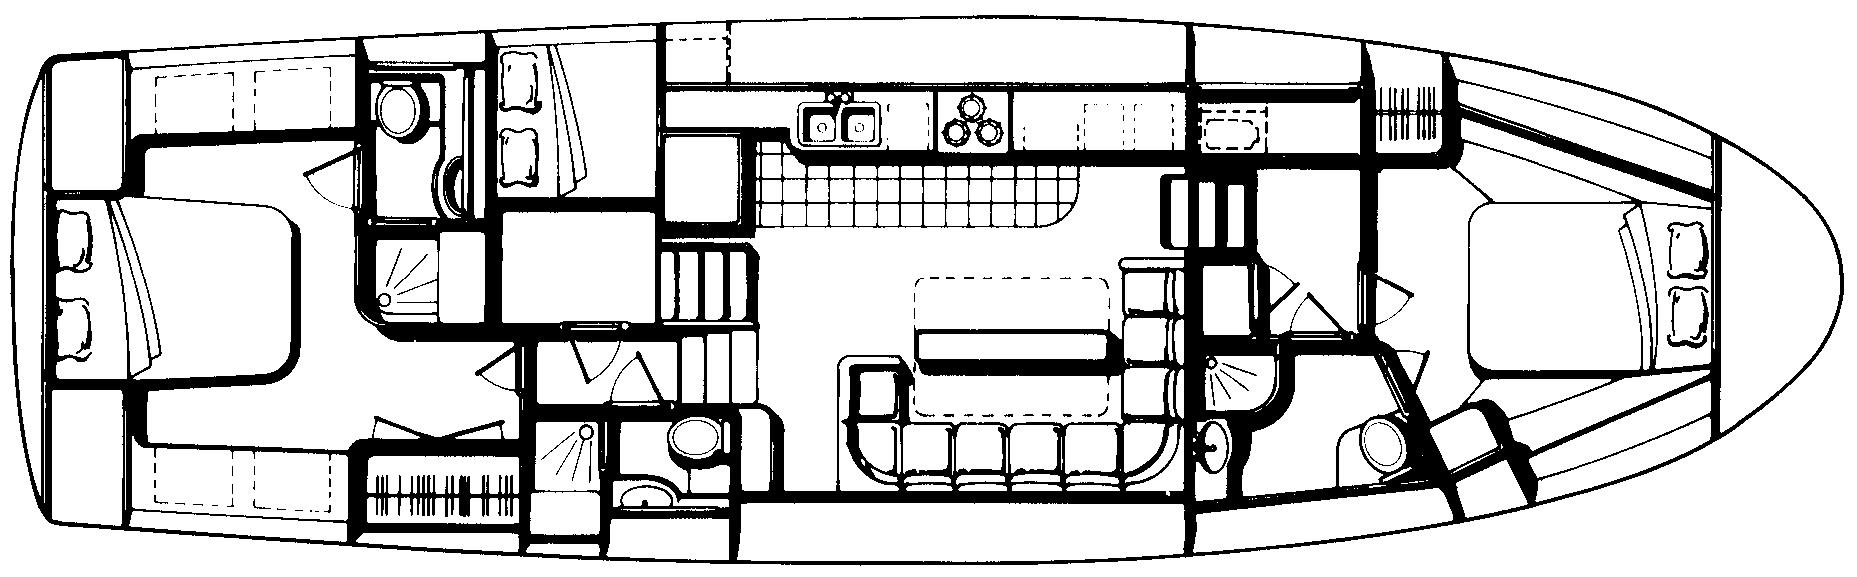 49 Motor Yacht Floor Plan 2